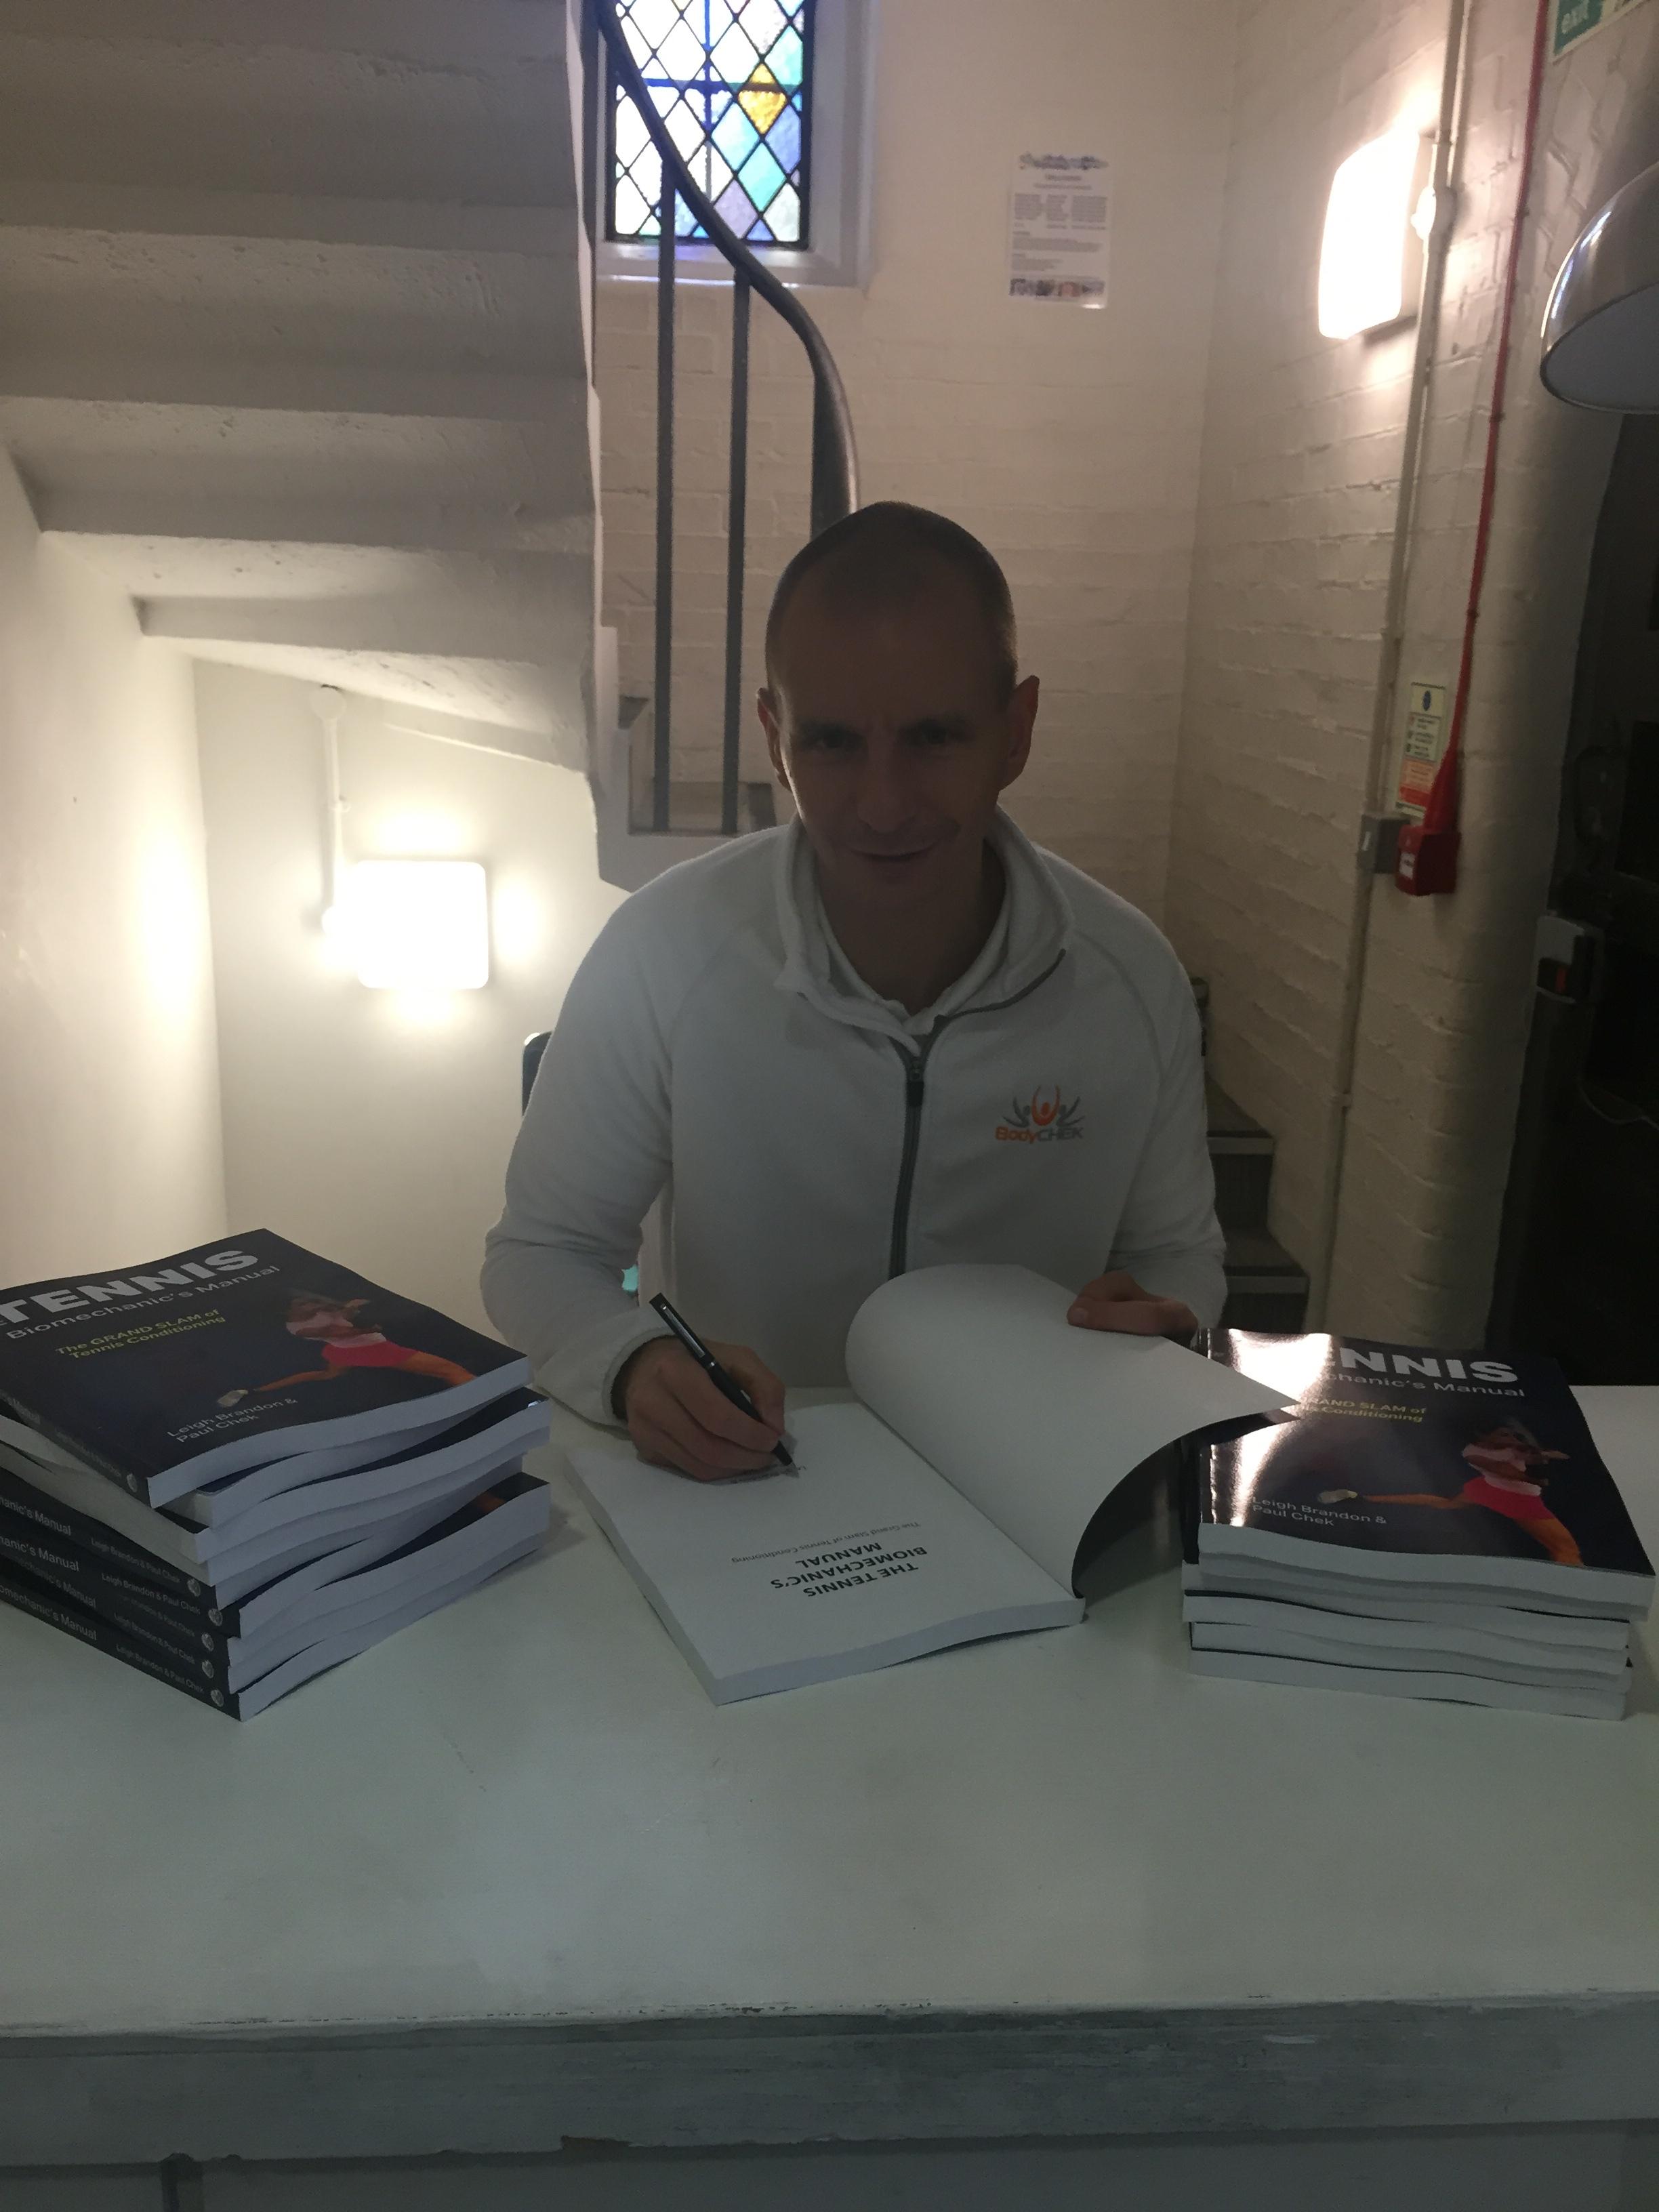 CHEK Exercise Coach and The Tennis Biomechanics Manual